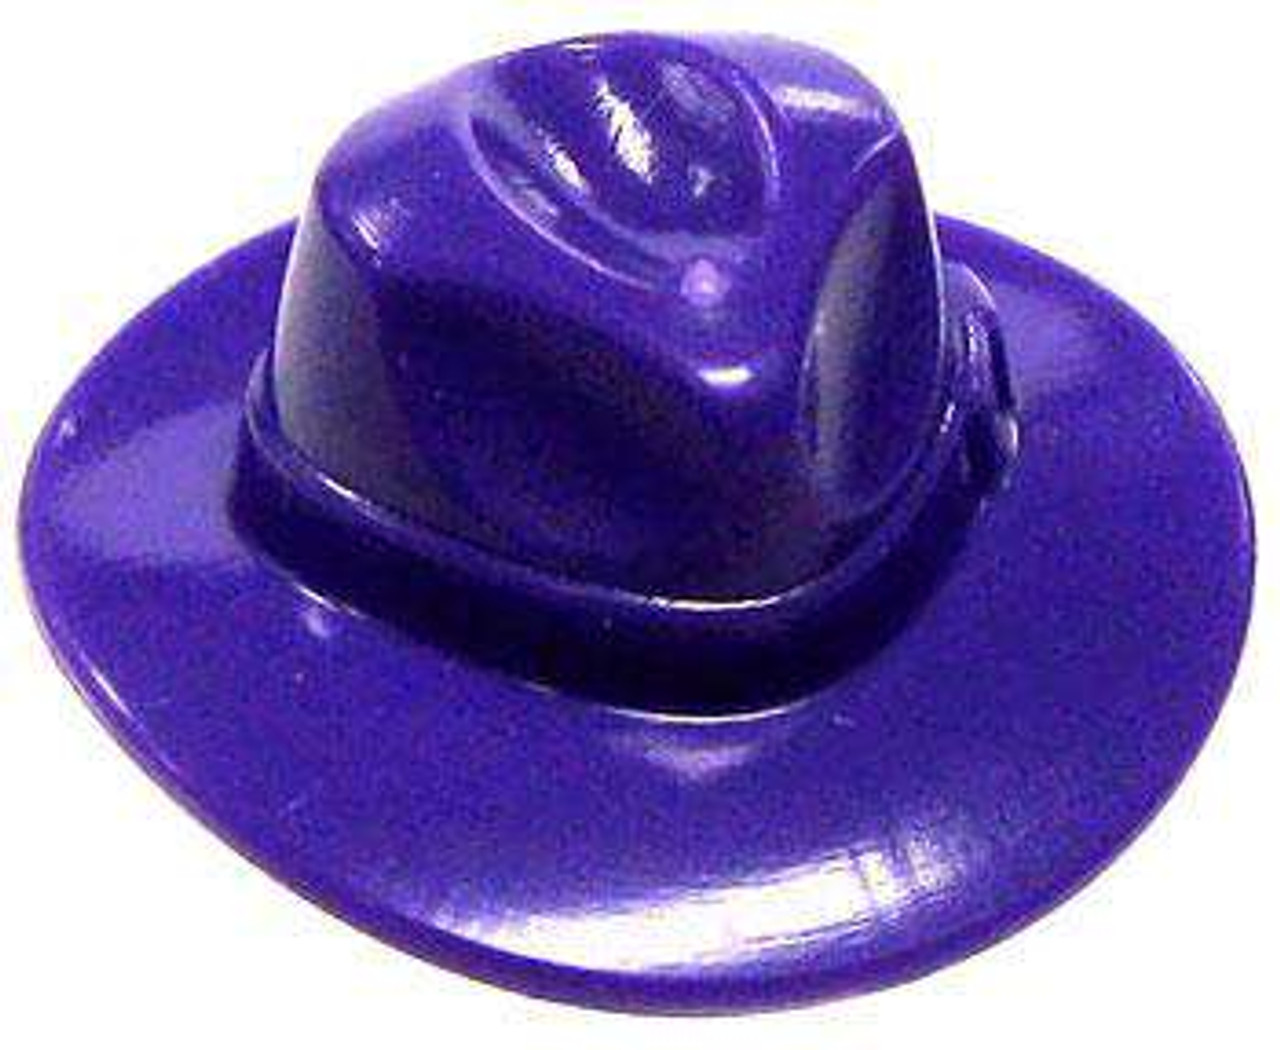 LEGO Minifigure Parts Purple Fedora Hat Minifigure Accessory [Loose]